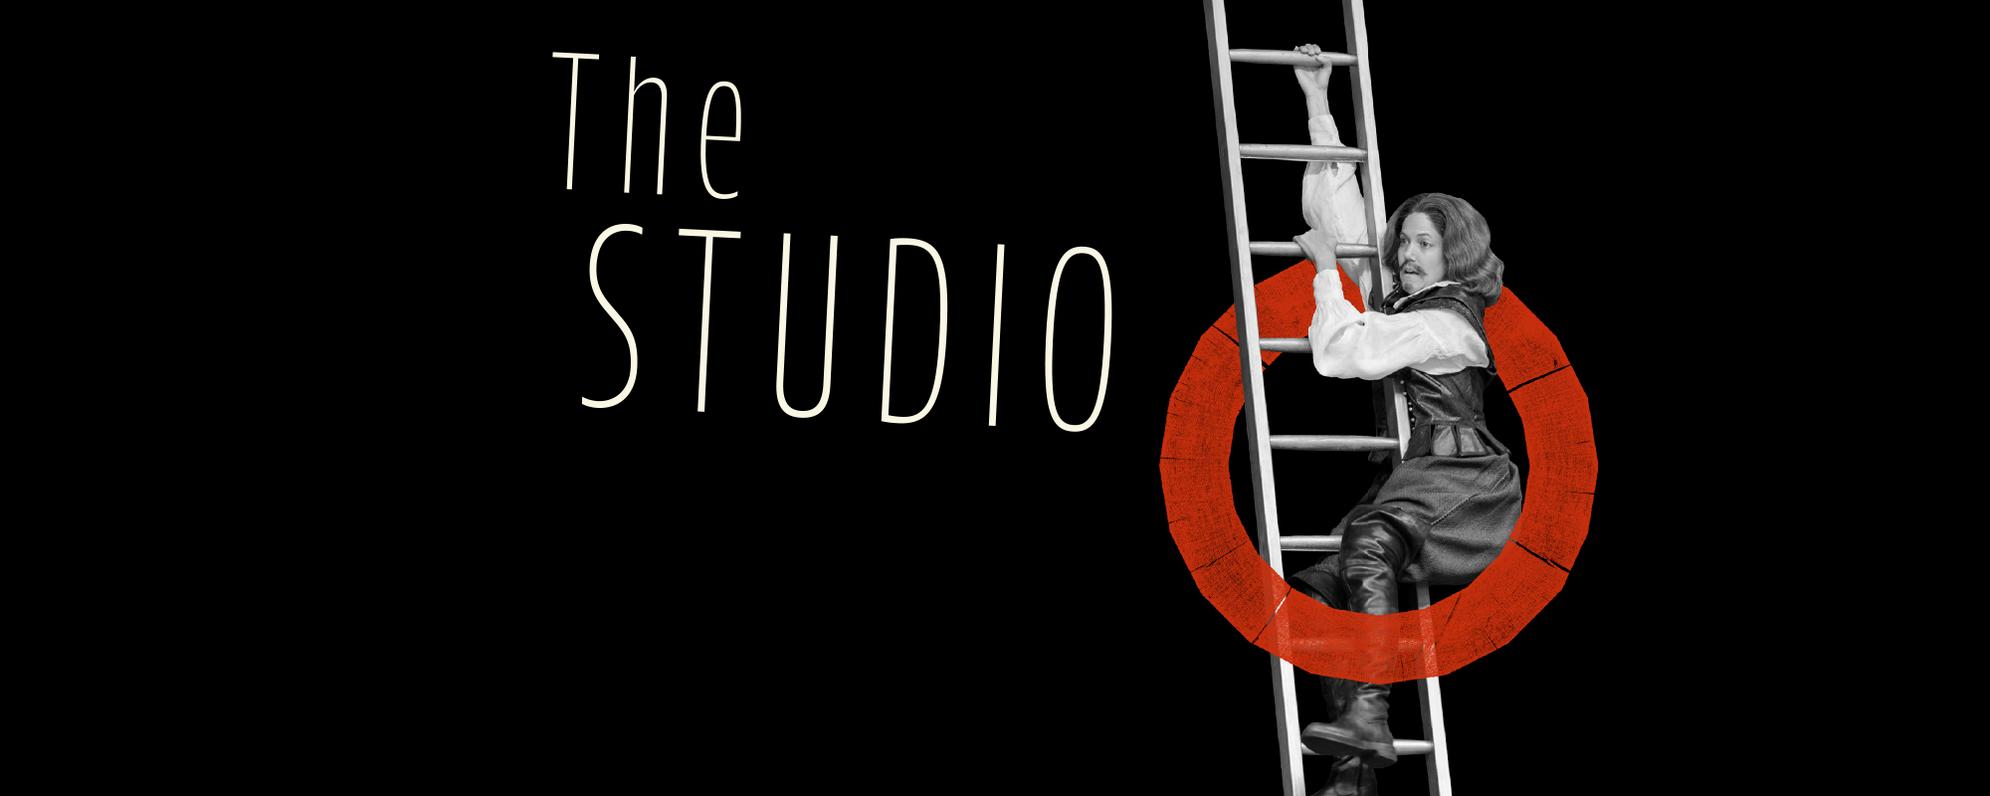 A cut-out image of an actor climbing a ladder